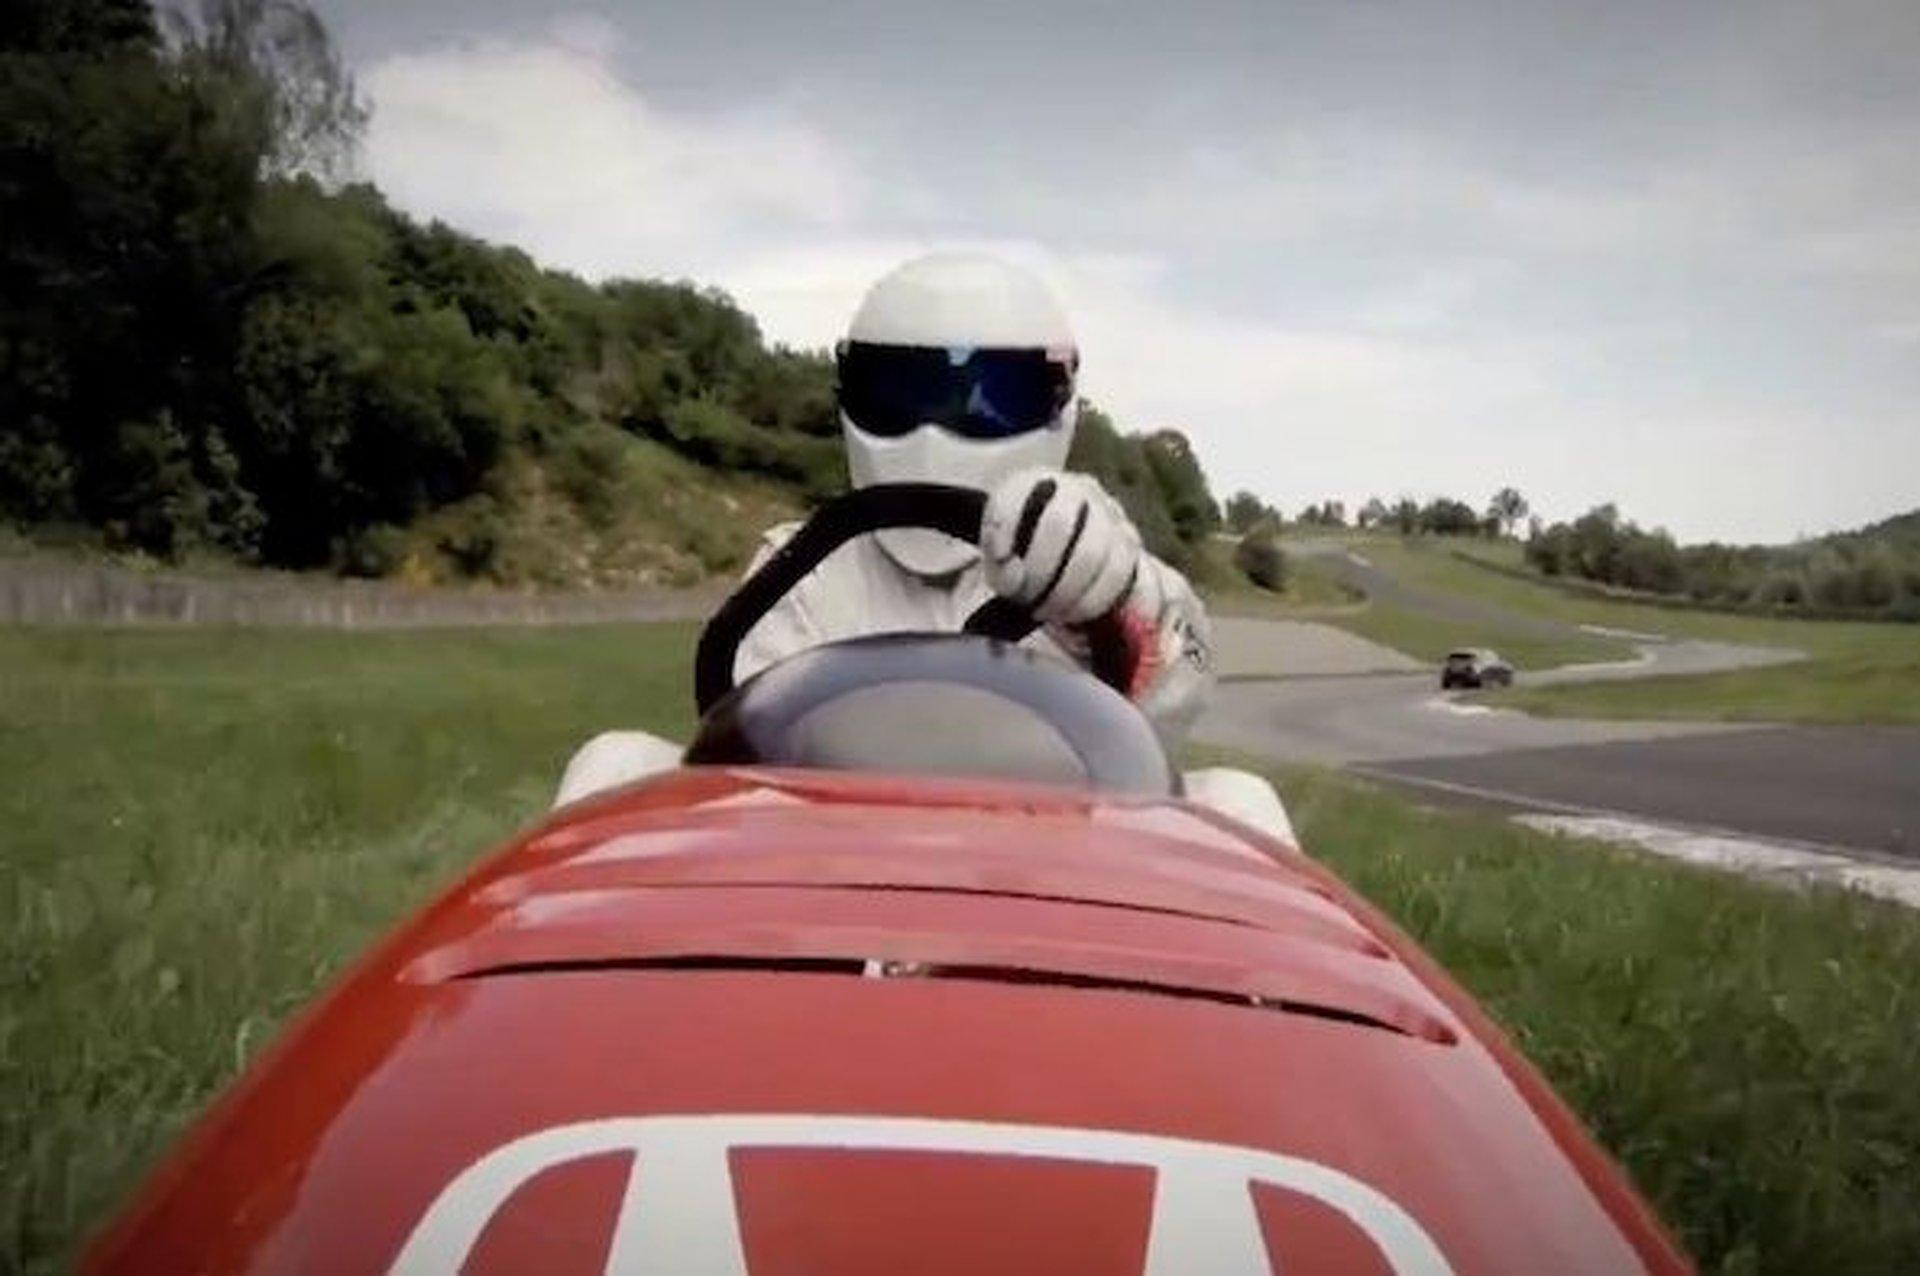 Watch The Stig Drive Around a 130MPH Honda Lawn Mower